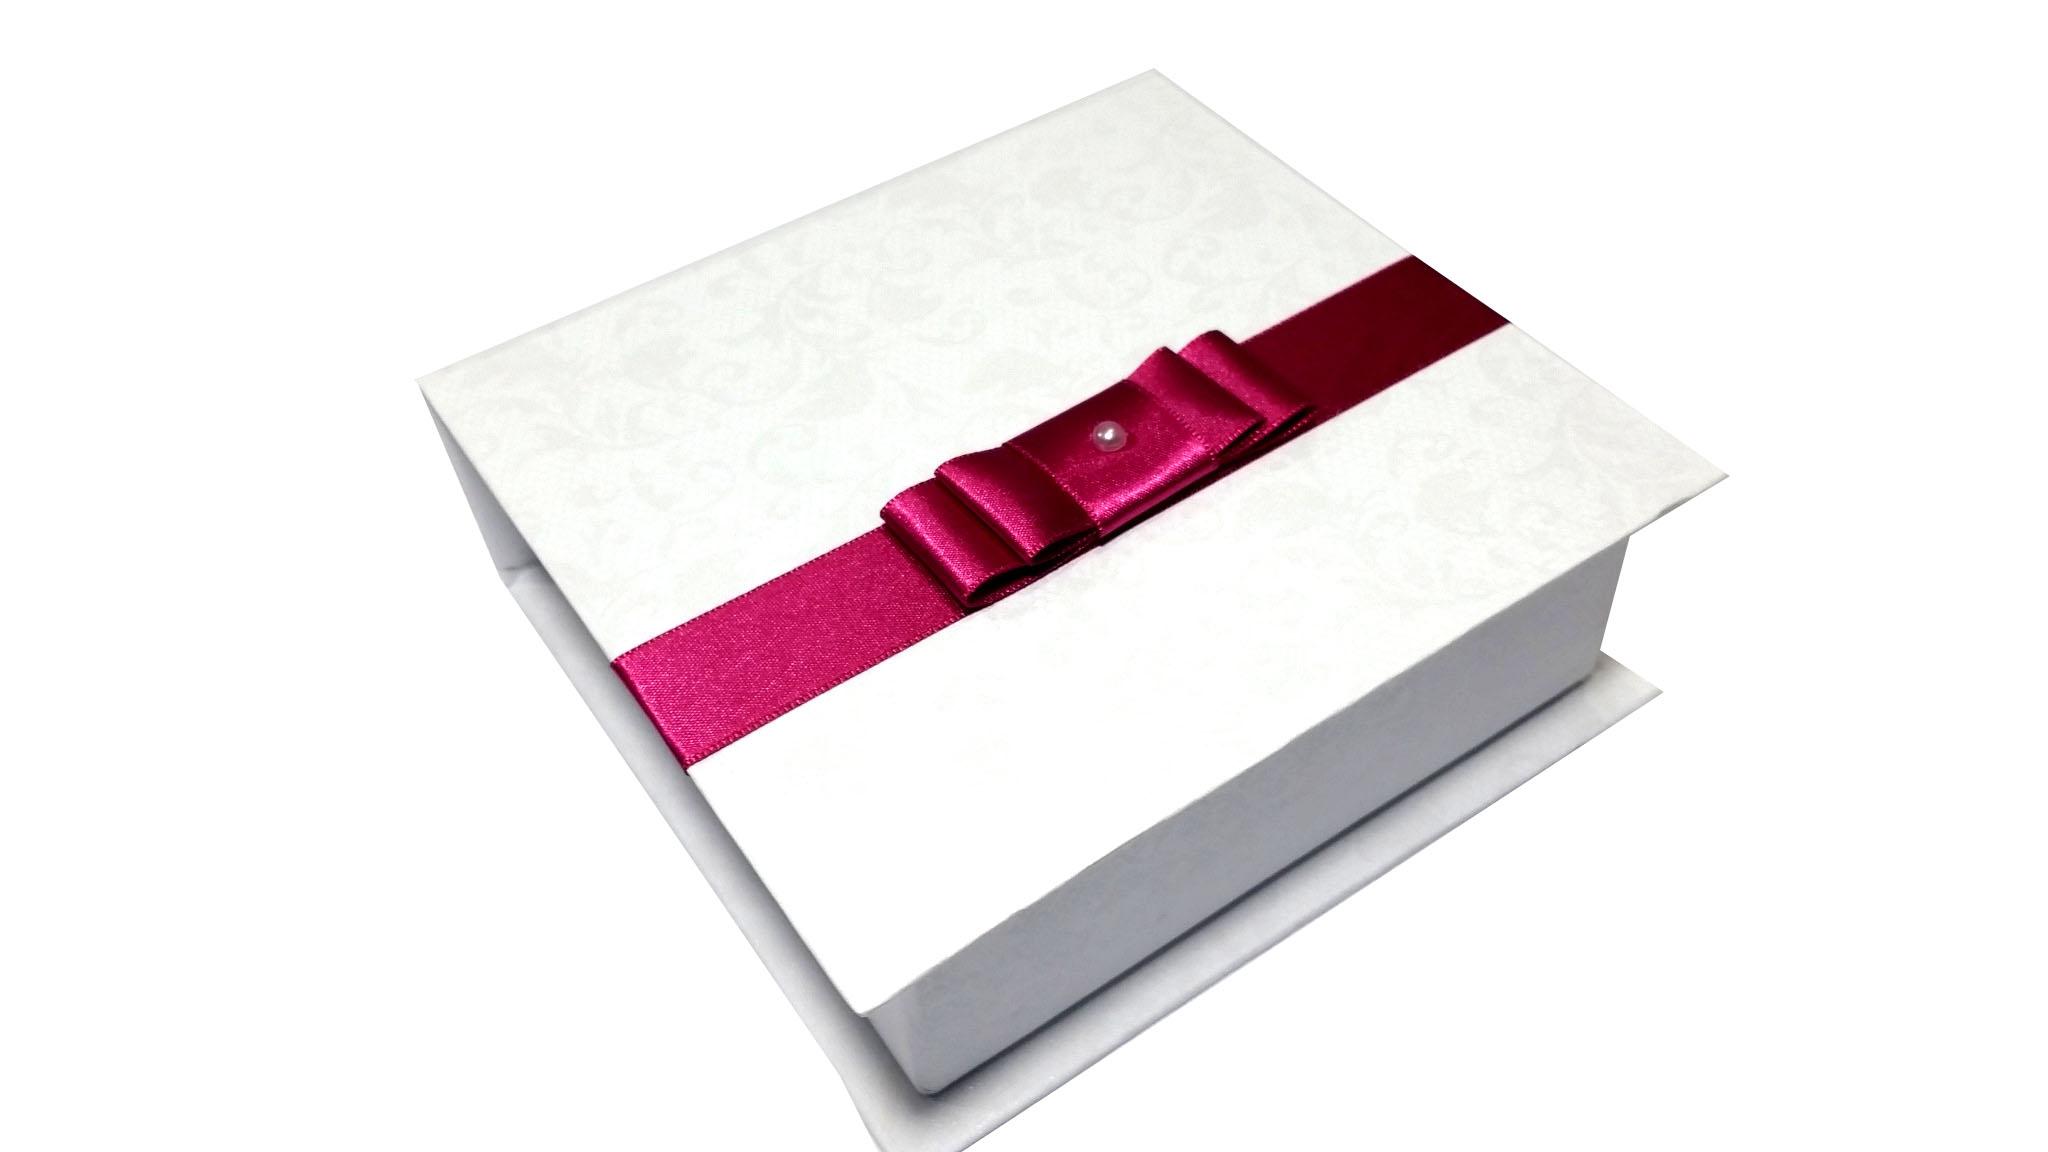 REF 0871 - Caixa PP Quadrada